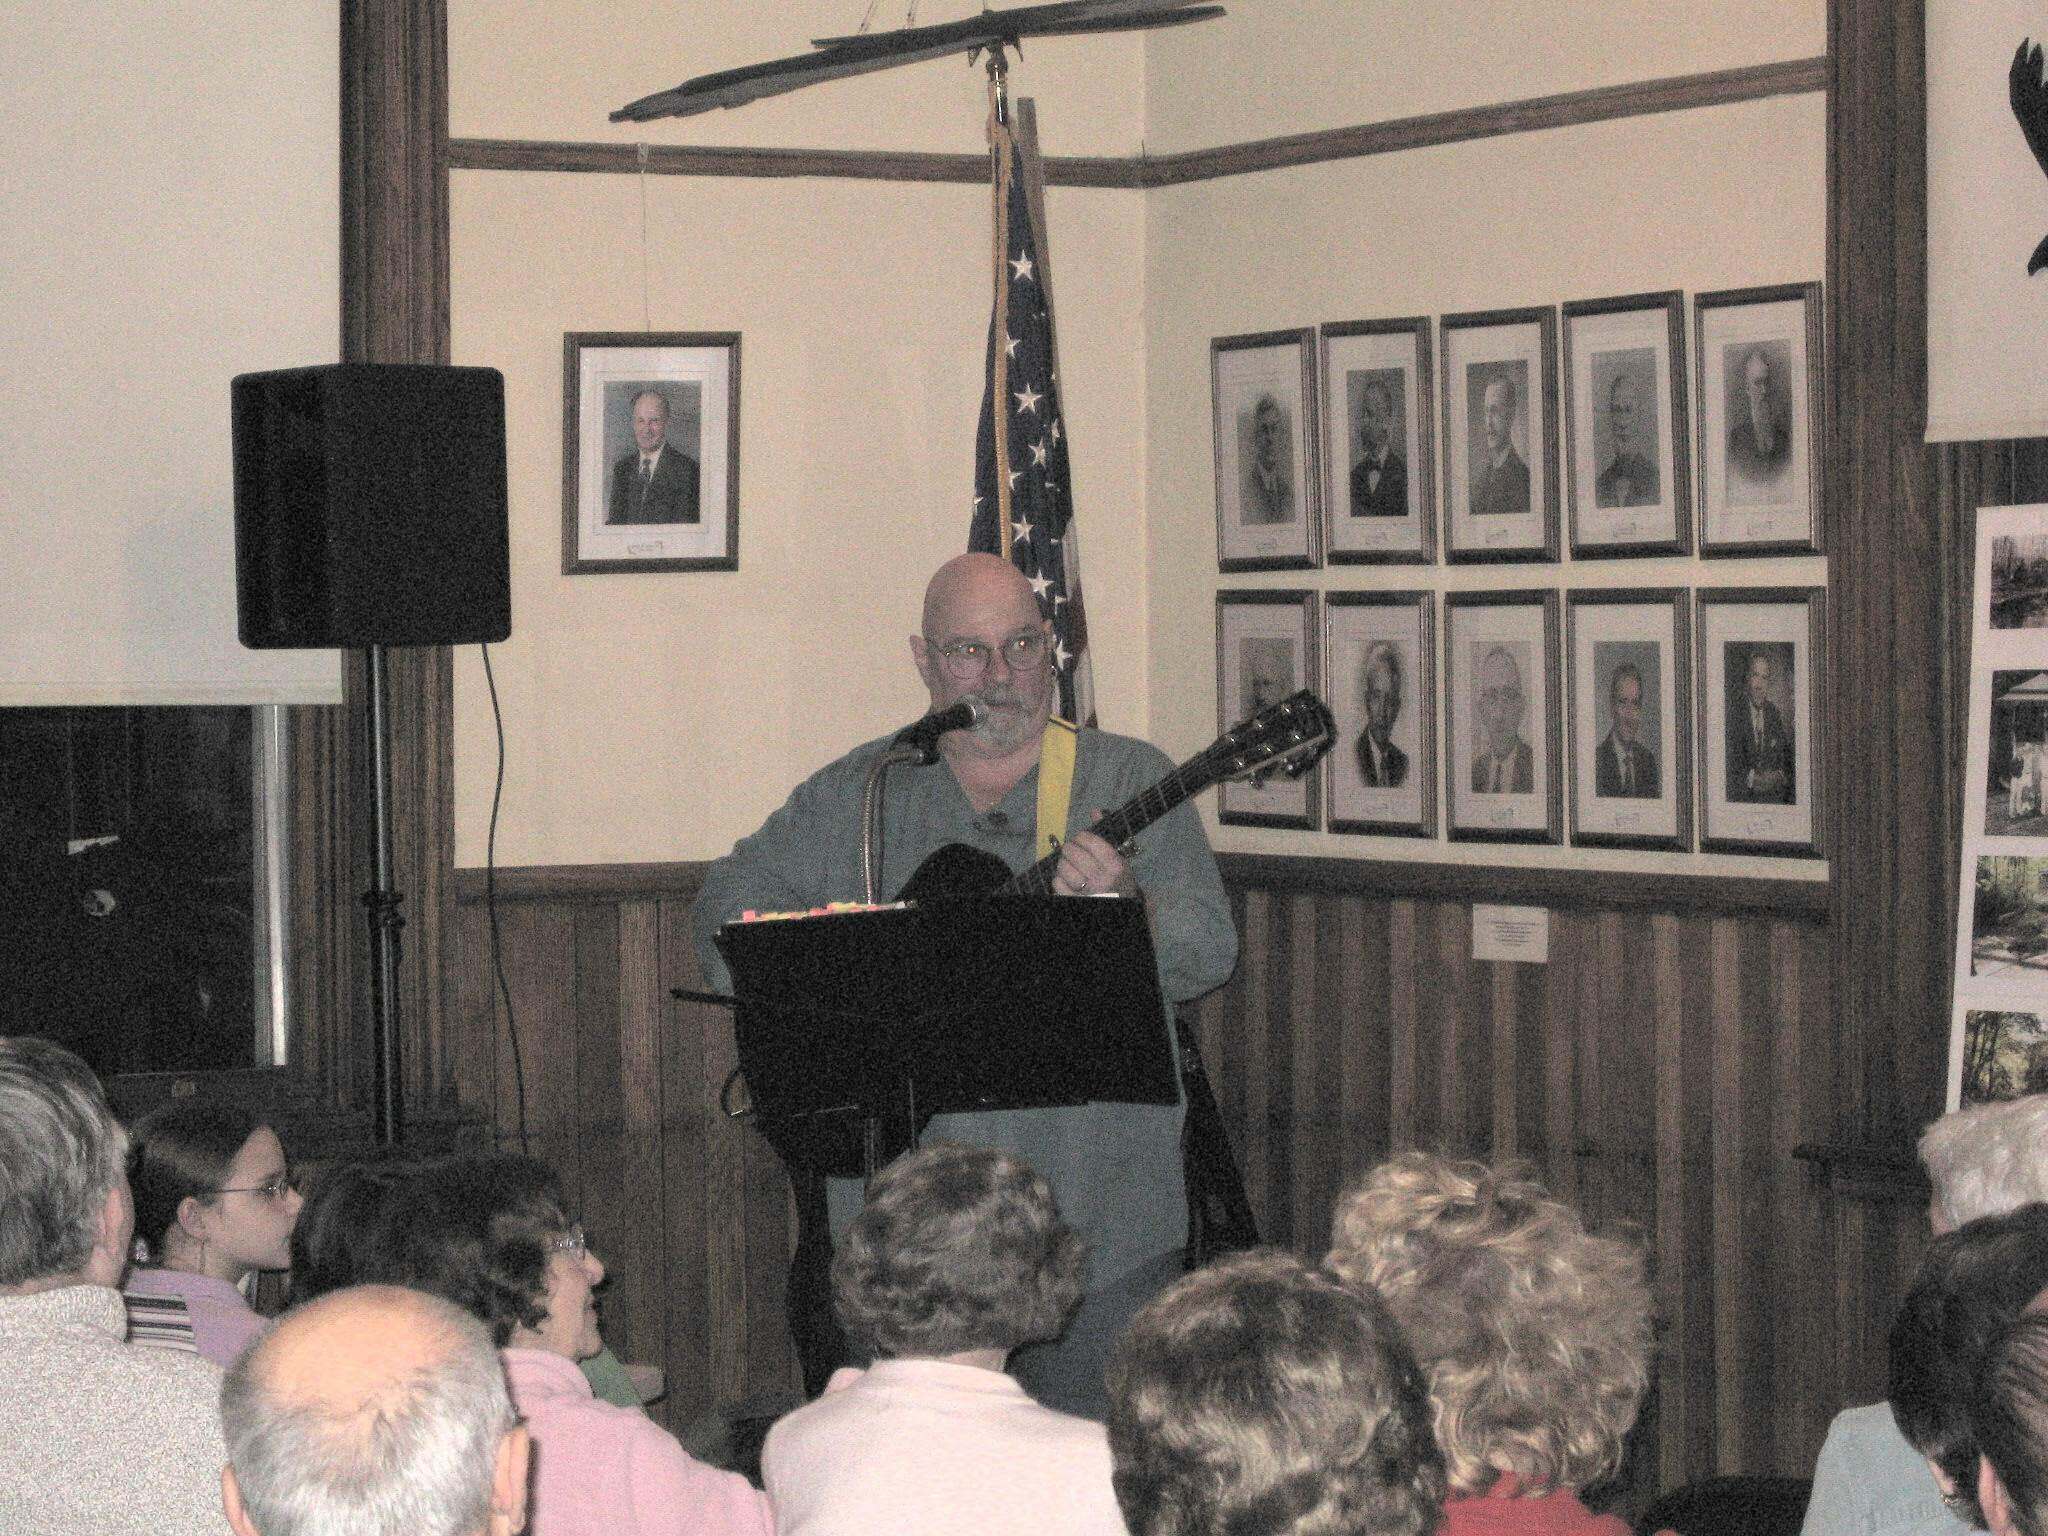 Singer-songwriter Jim Six, the headline entertainment of the evening.